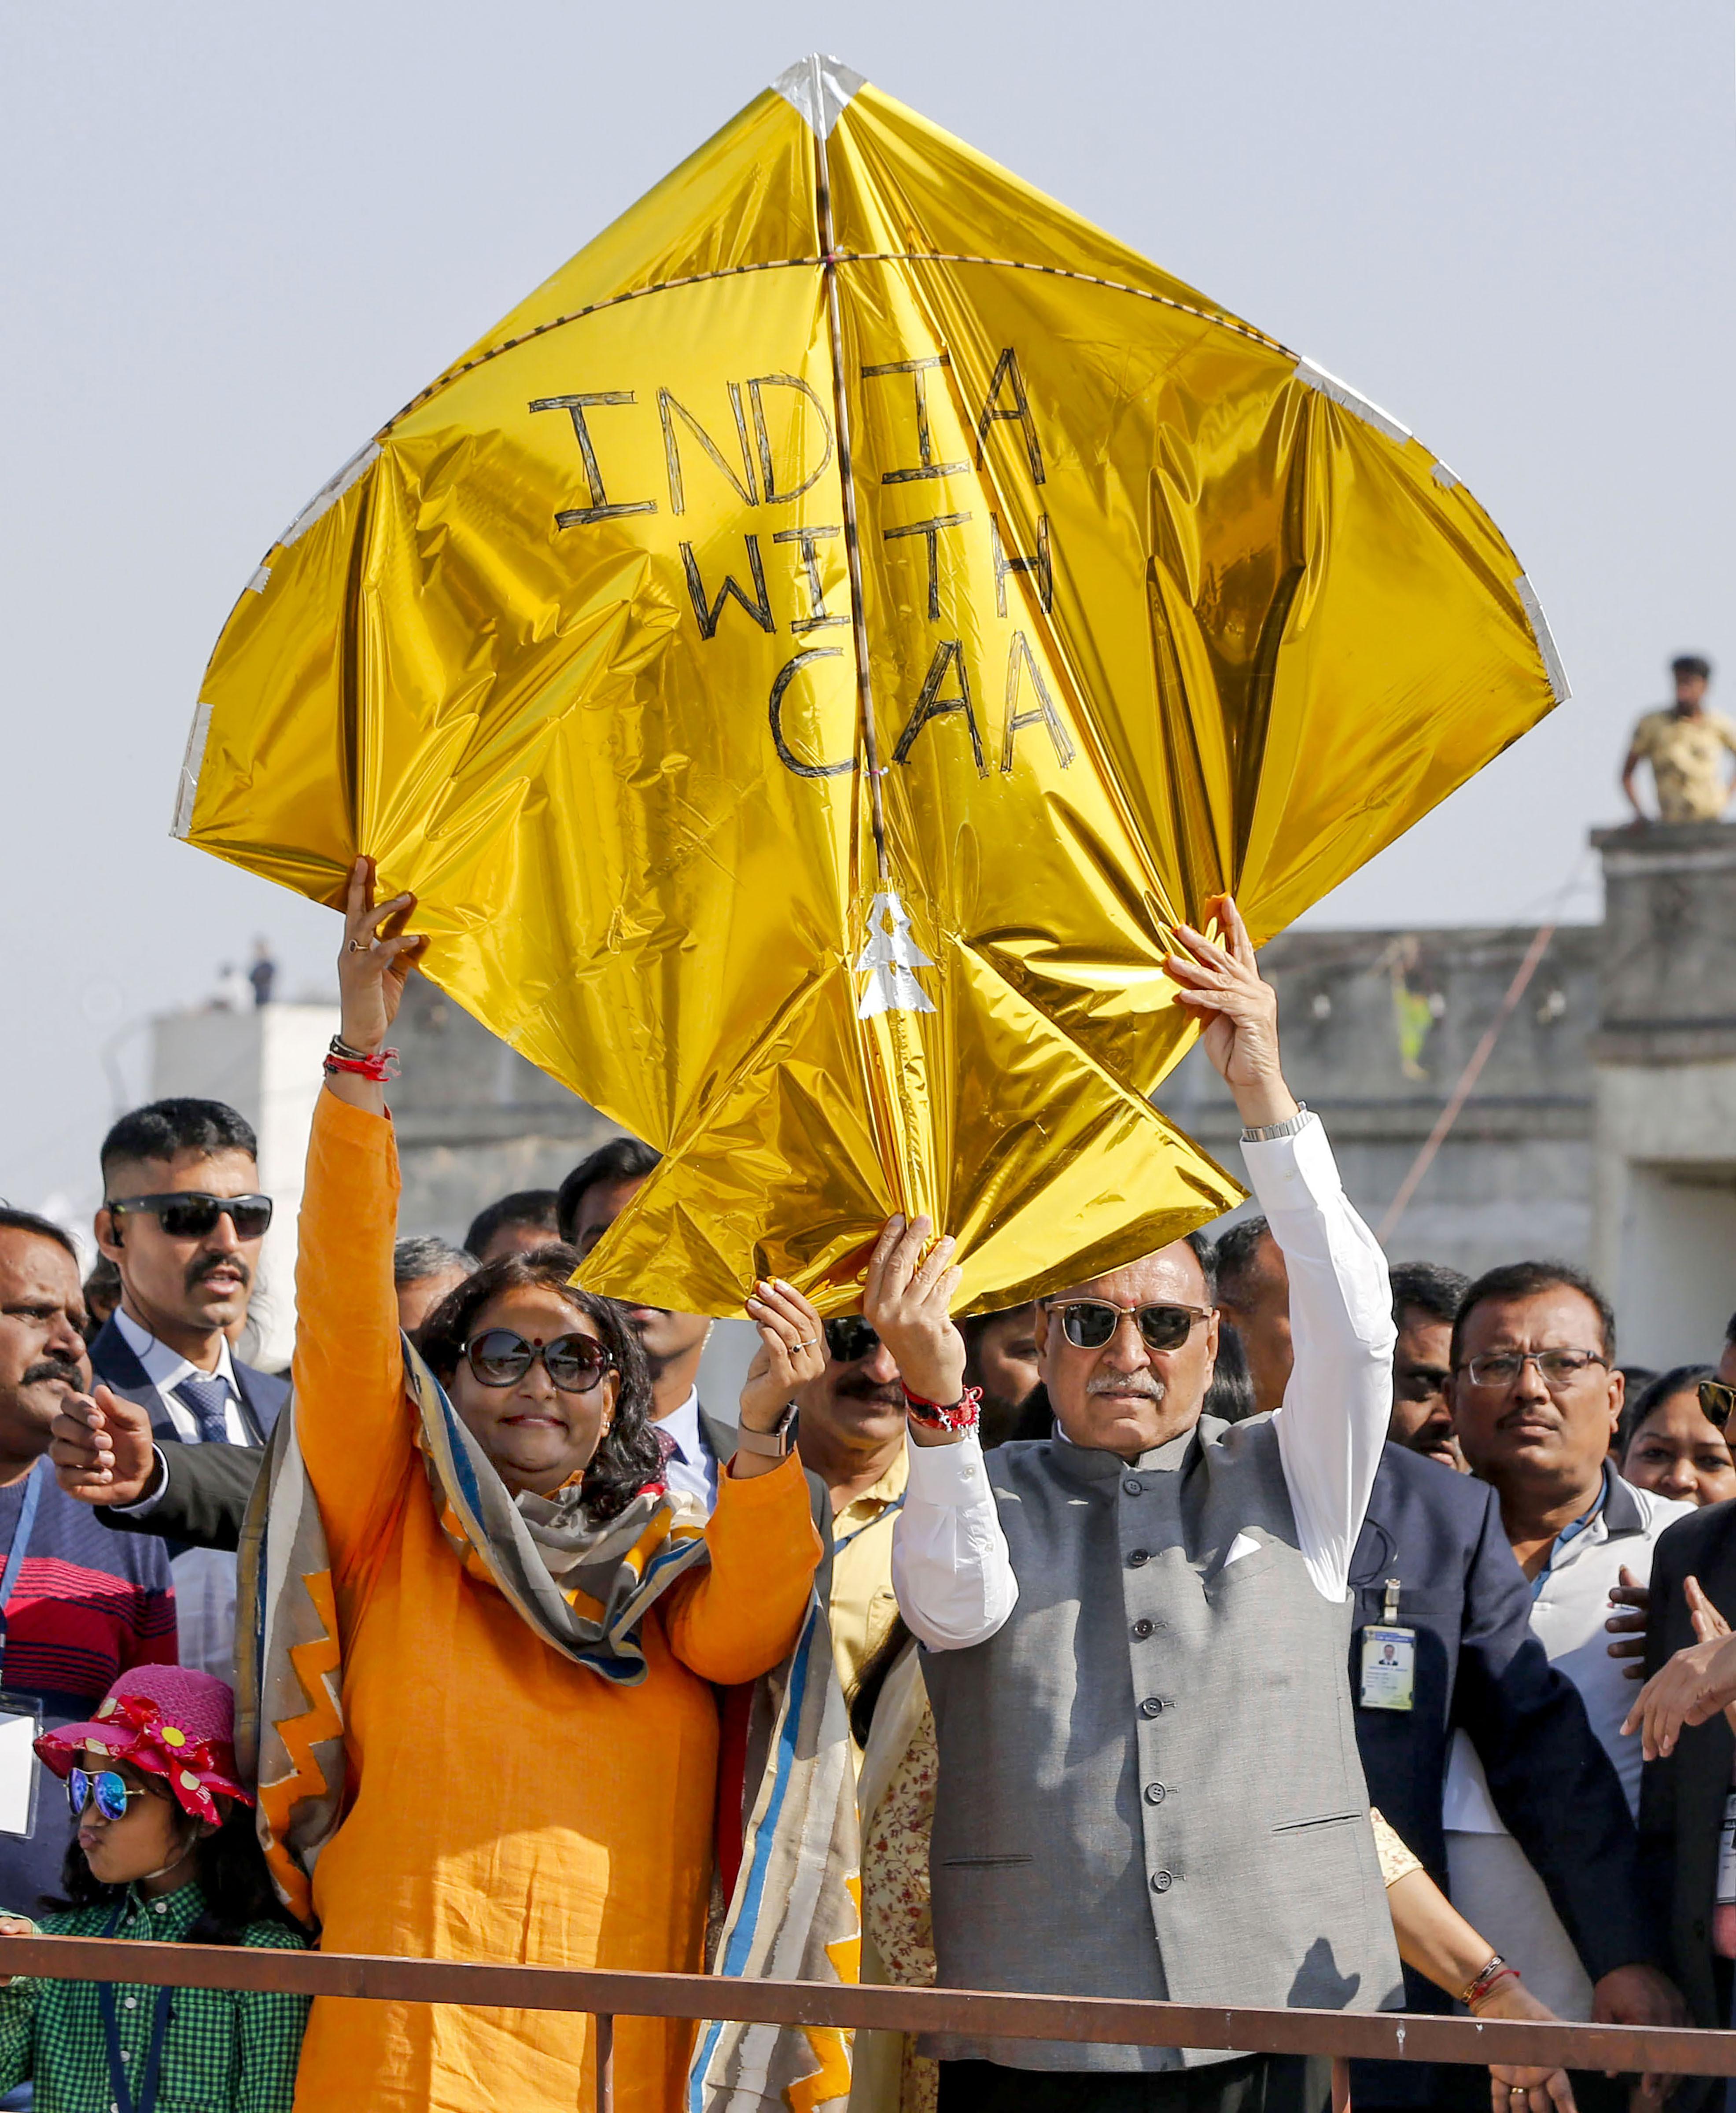 Gujarat chief minster Vijay Rupani holds a kite with message